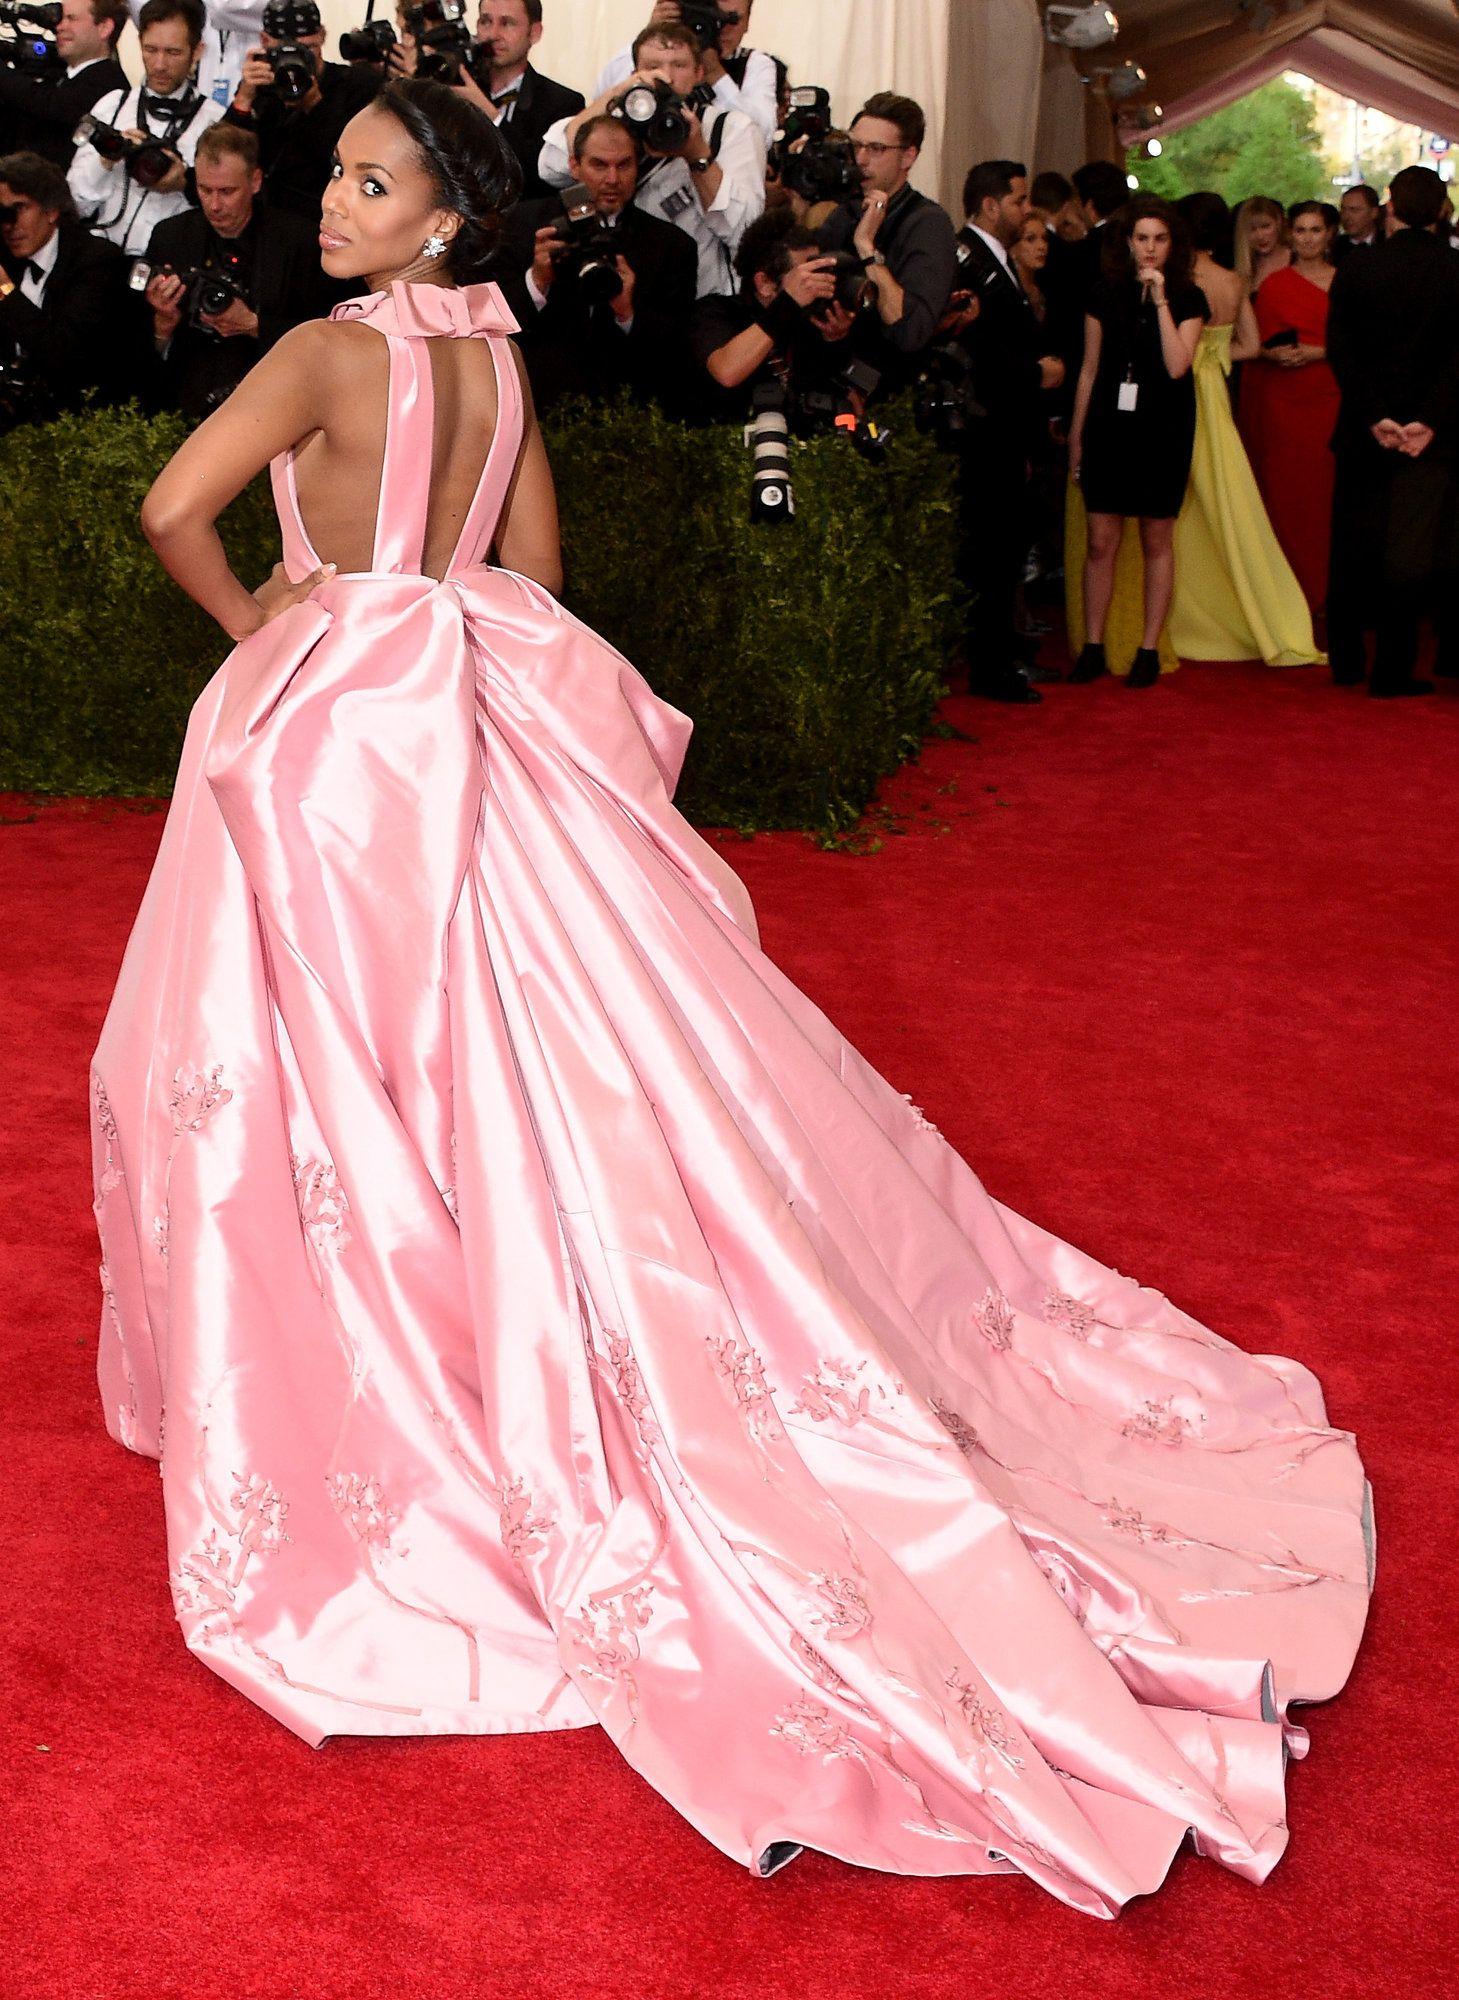 Met Gala 2015 Fashion: Live from the Red Carpet | Estrafalario, Moda ...